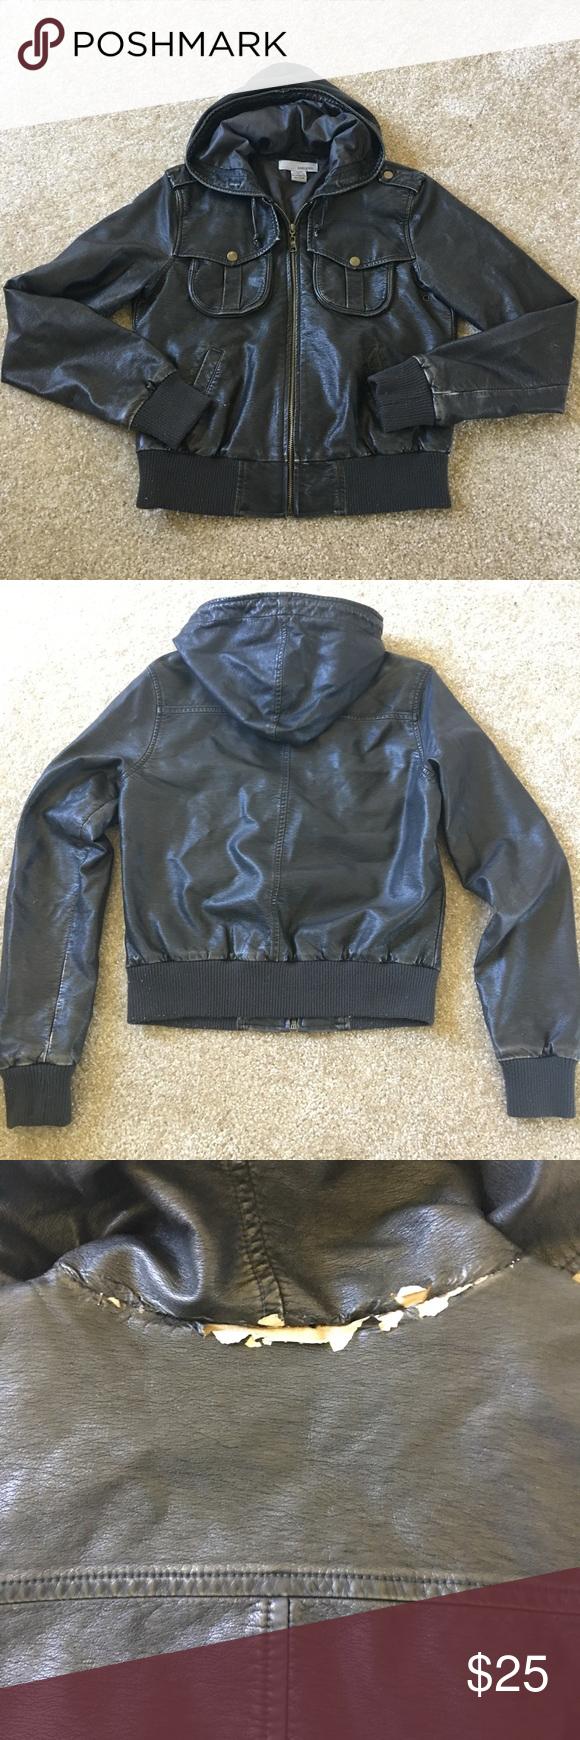 Leather jacket damage - Faux Leather Jacket Faux Leather Jacket With Hood There Is Slight Damage Under The Hood